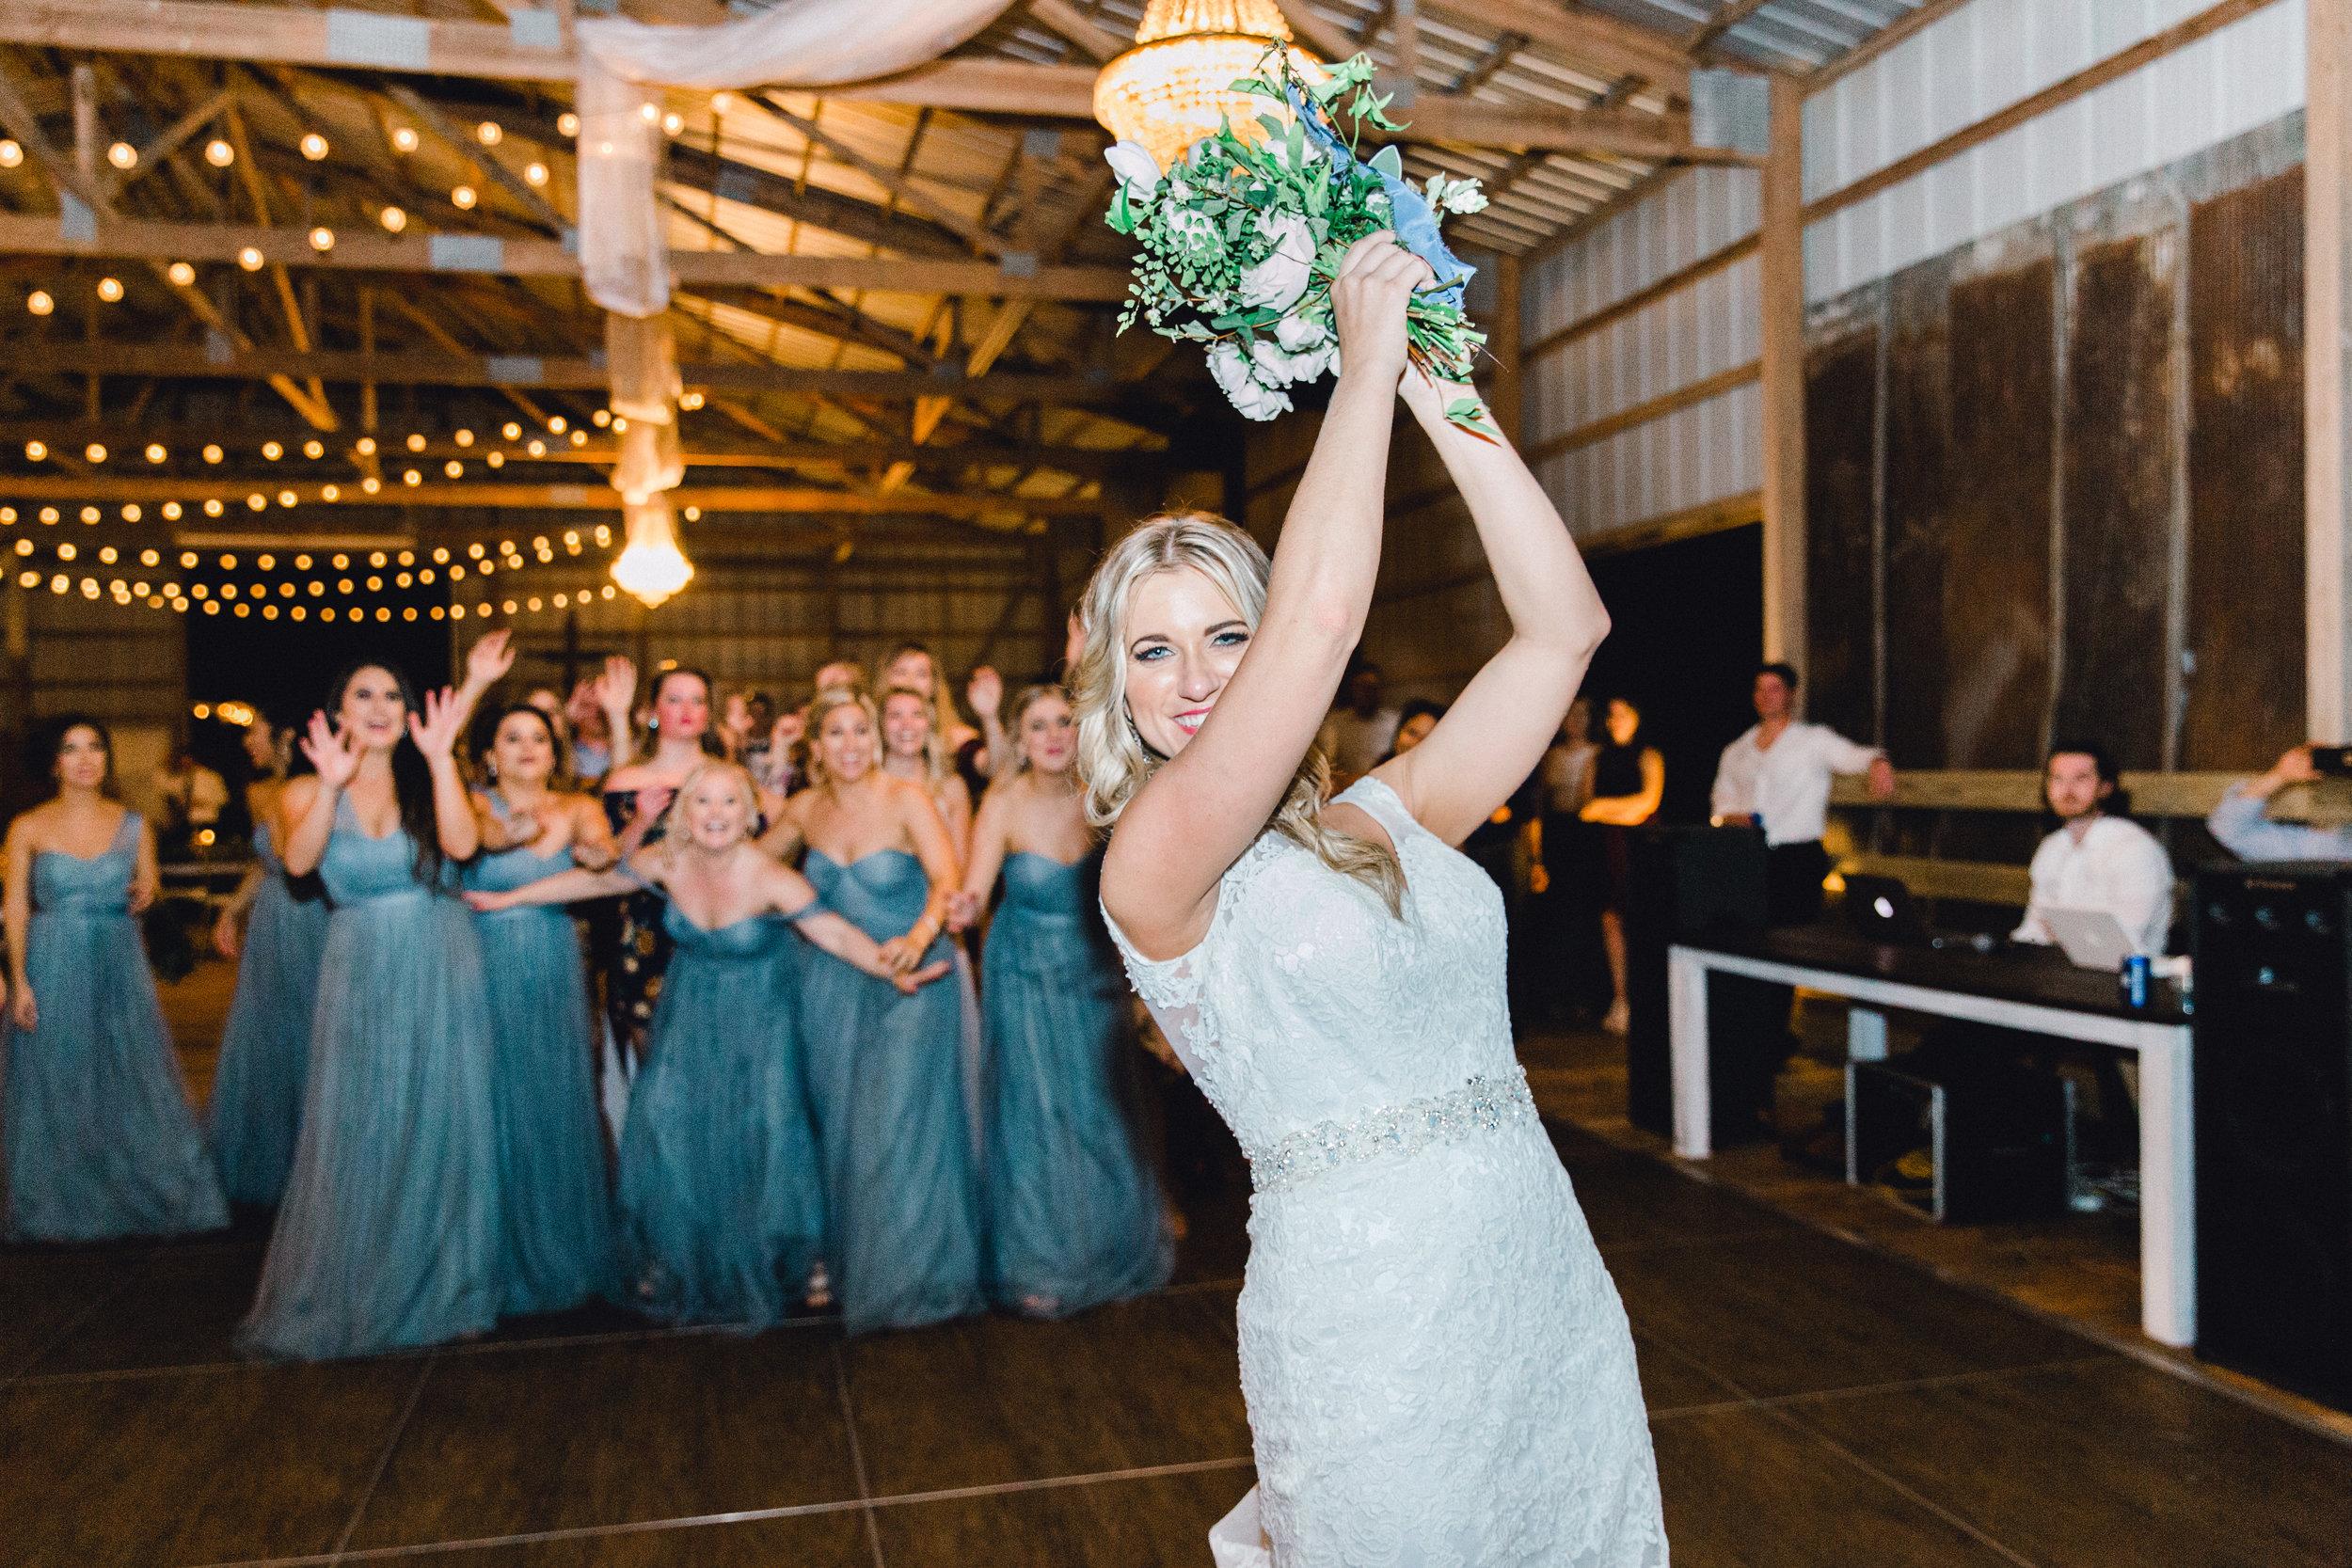 Paige-Mercer-Photography-Florida-Wedding-Photographer-Alyssa&Drew-100.jpg